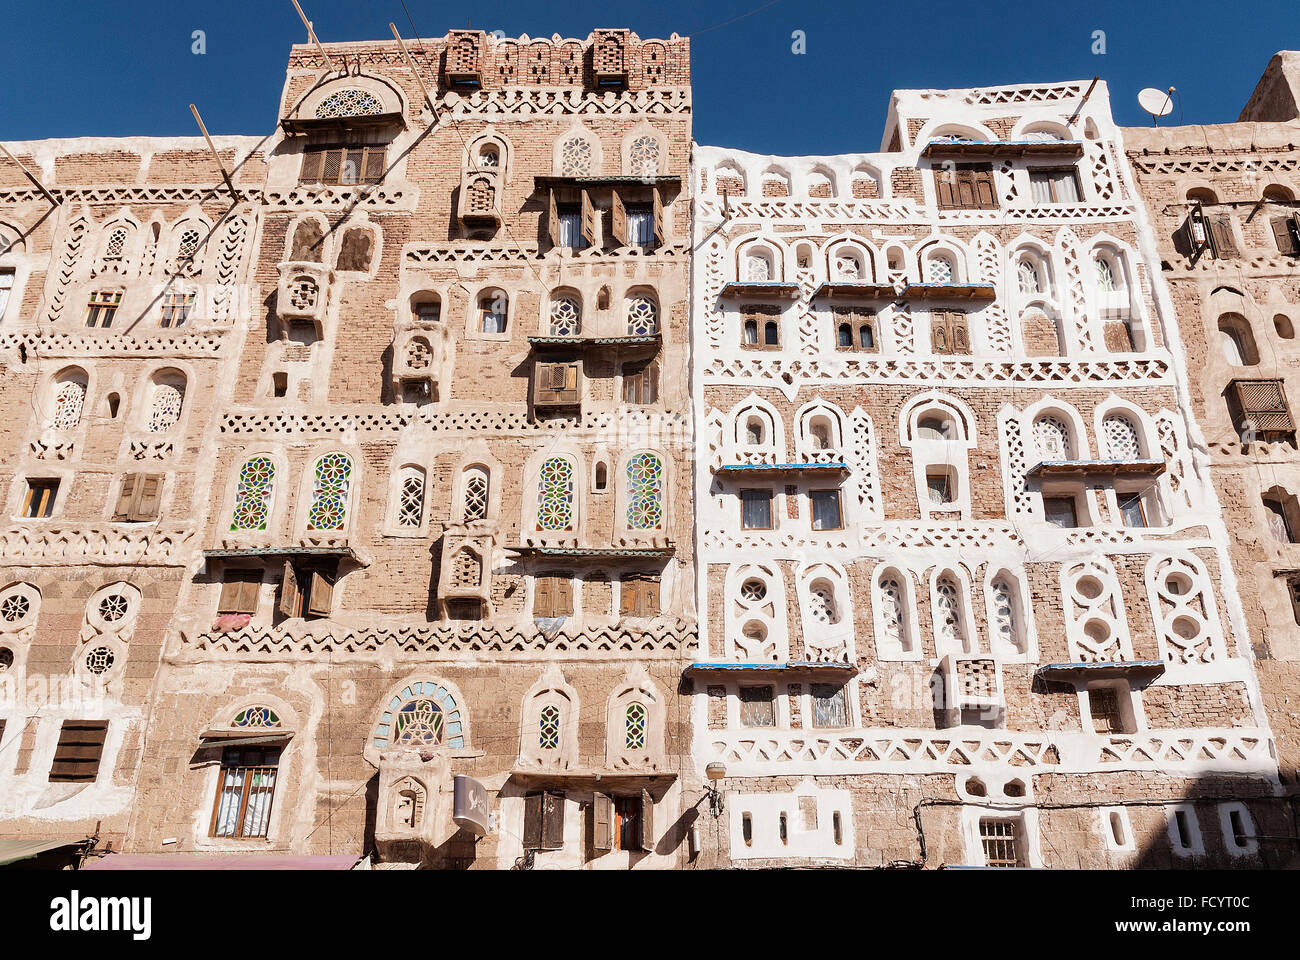 traditional yemeni ancient buildings in sanaa old town yemen - Stock Image